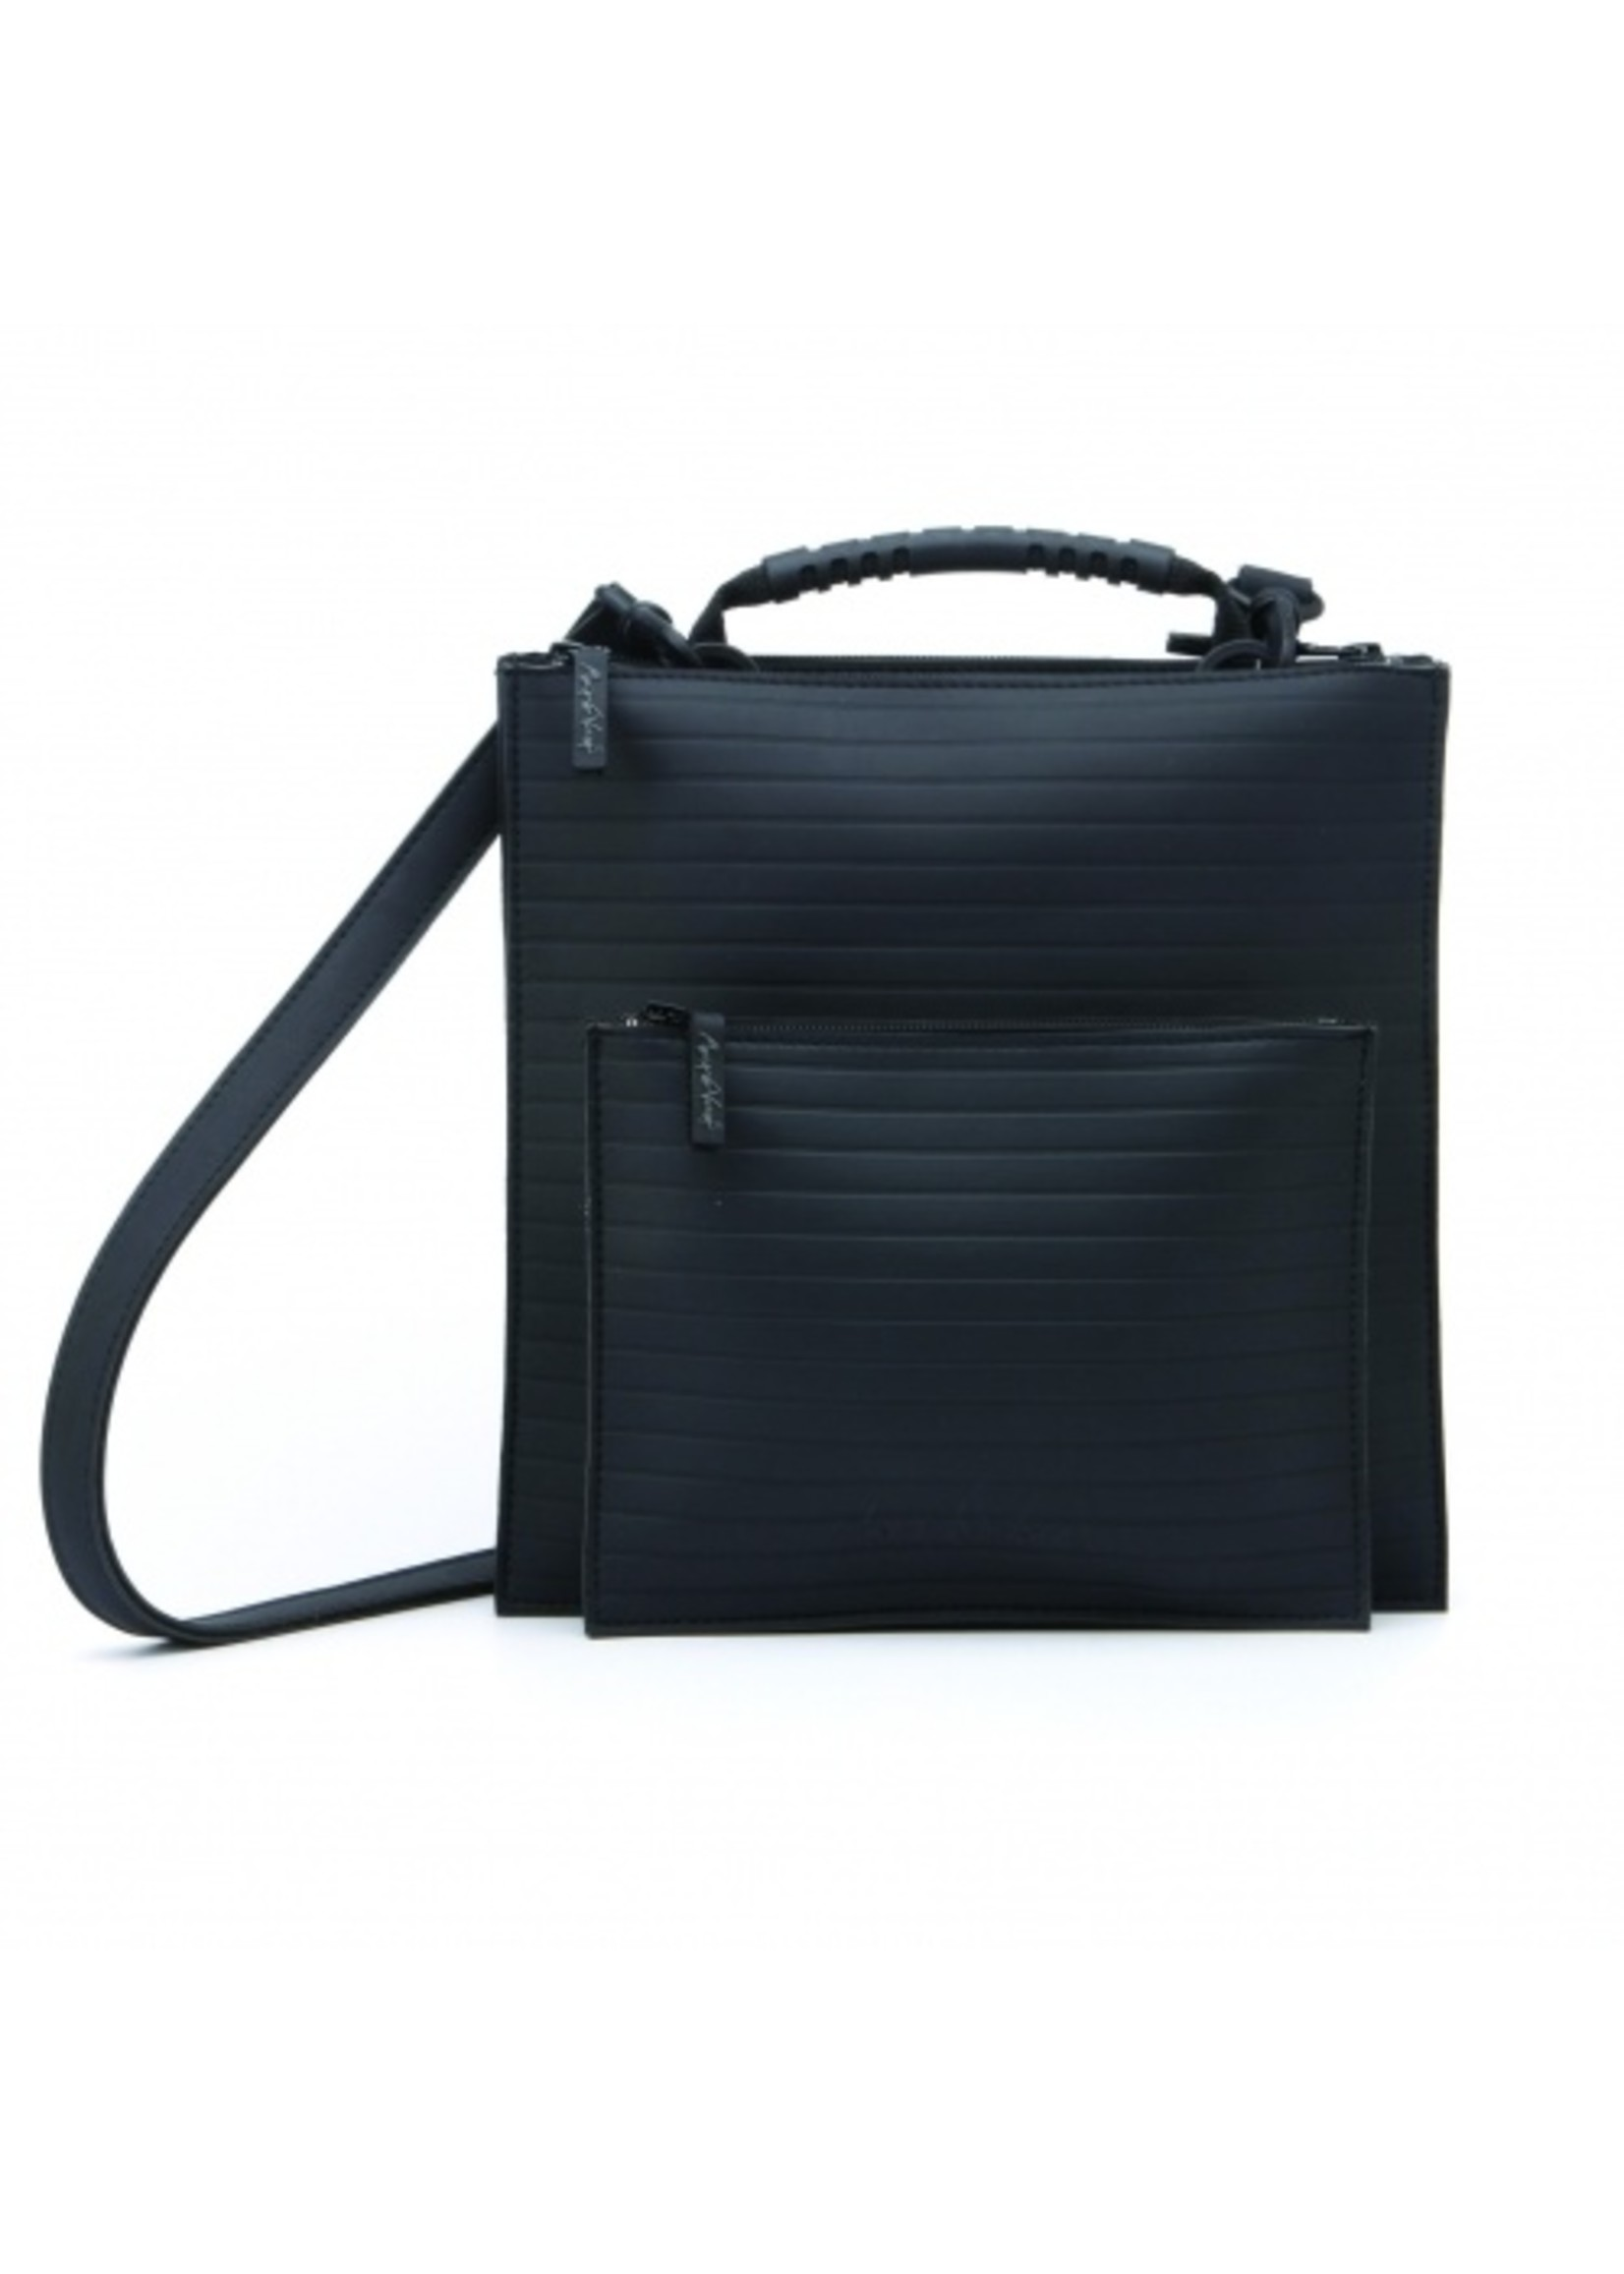 Maria La Verda bag Artificial leather black